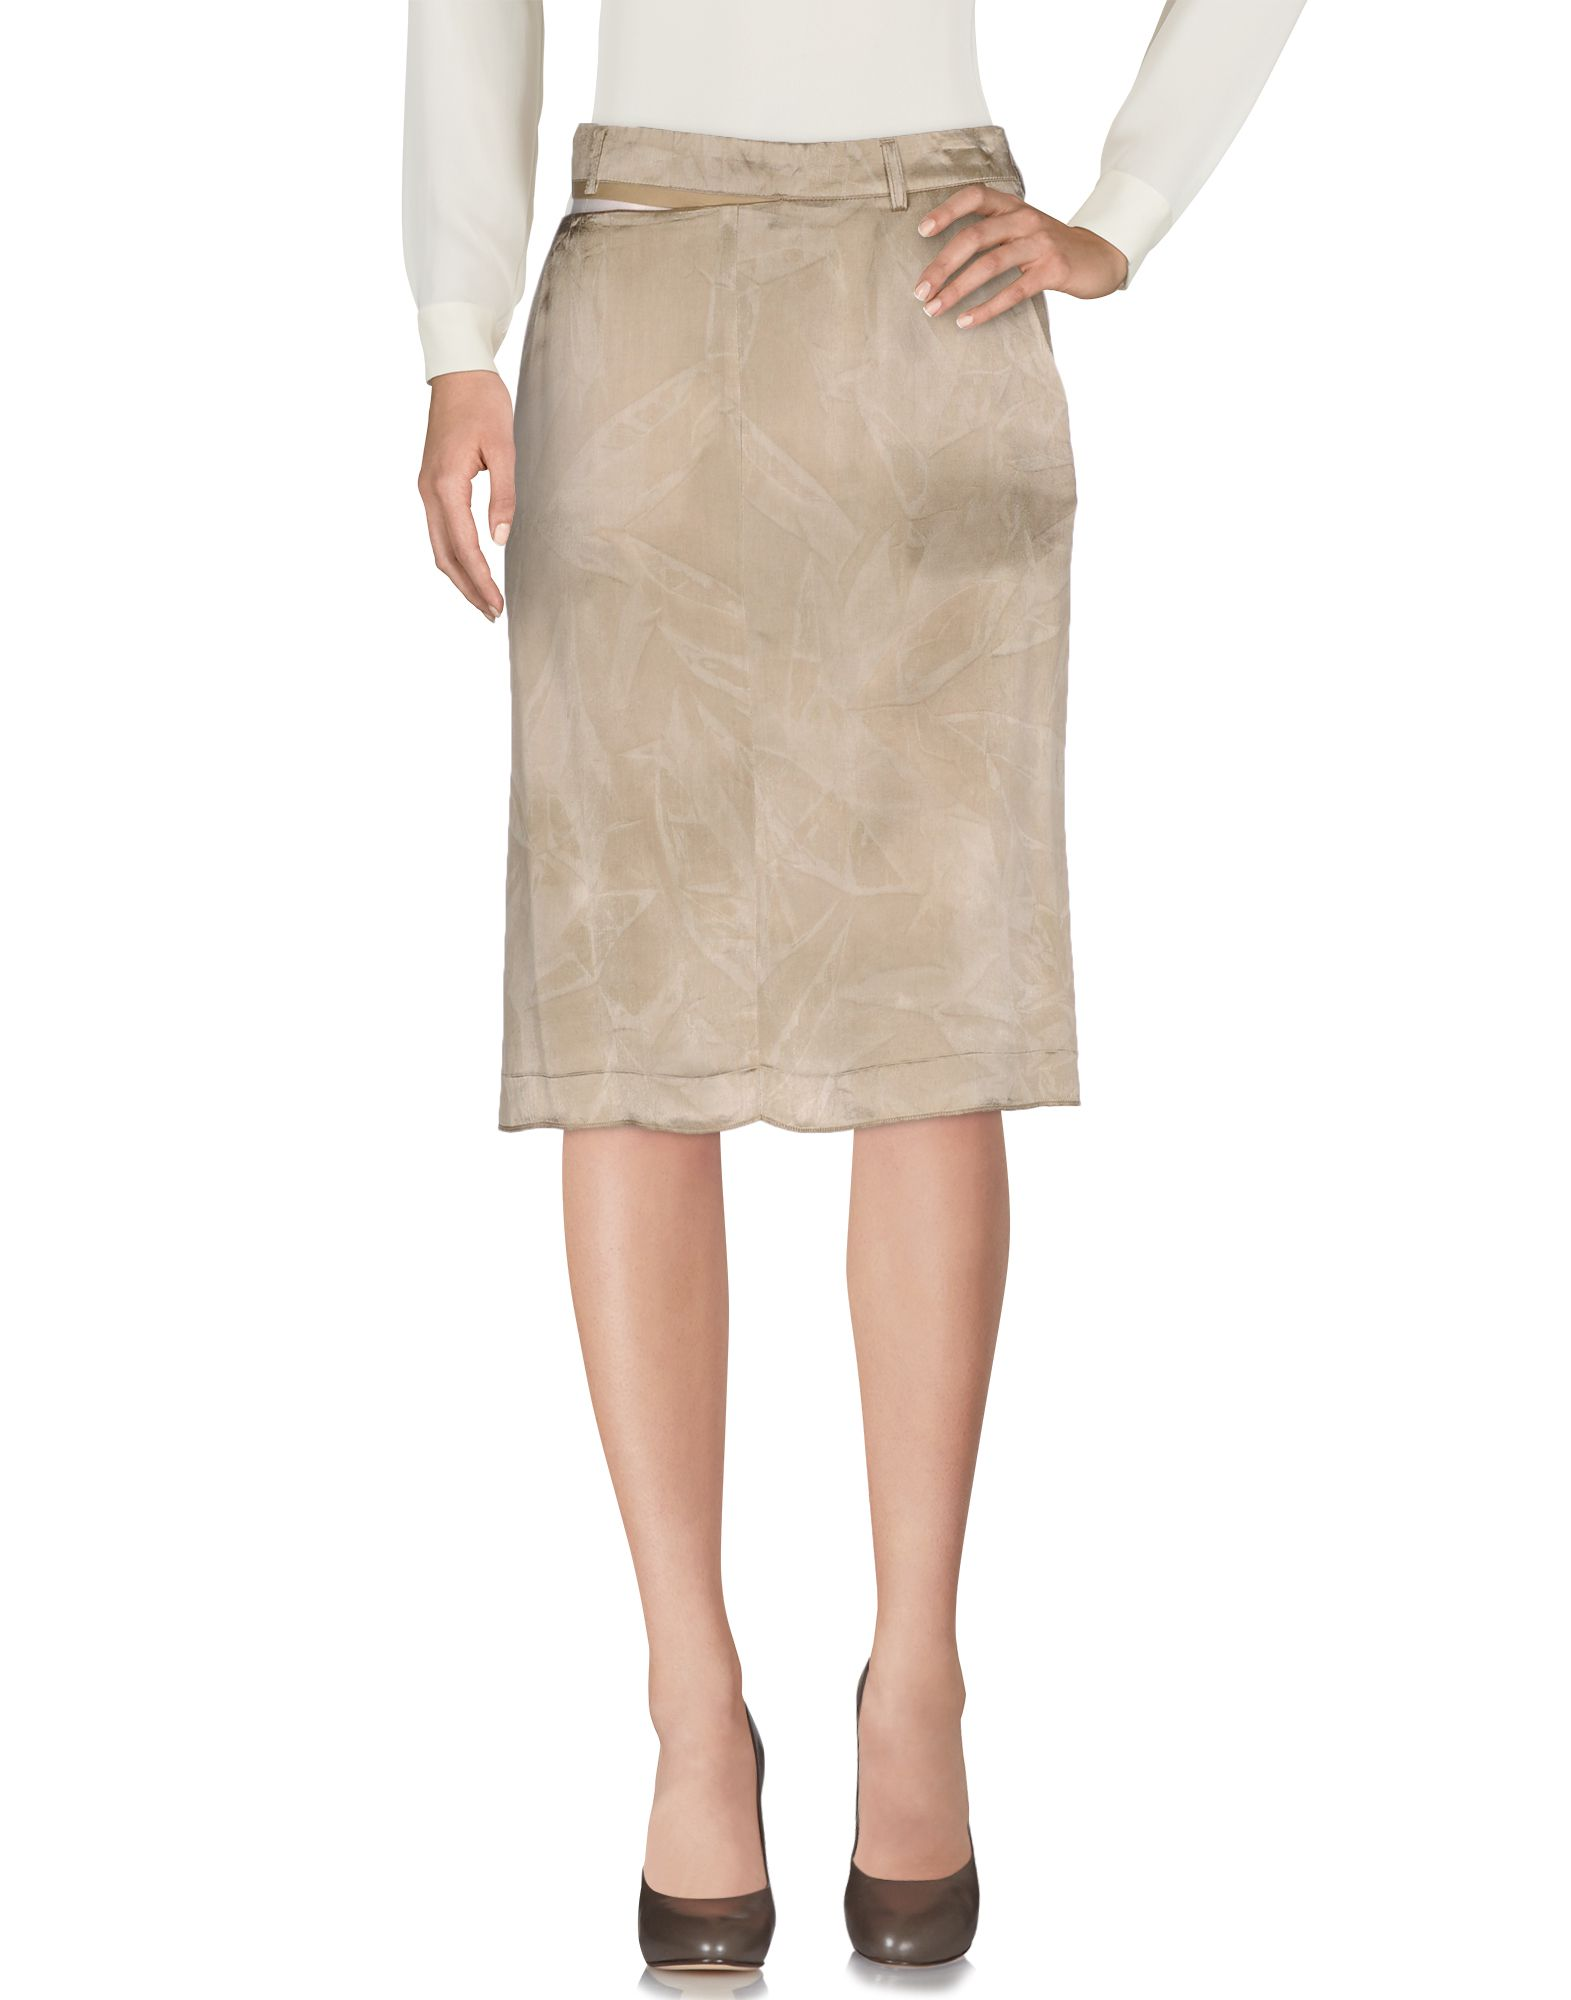 MAISON MARGIELA Damen Knielanger Rock Farbe Khaki Größe 4